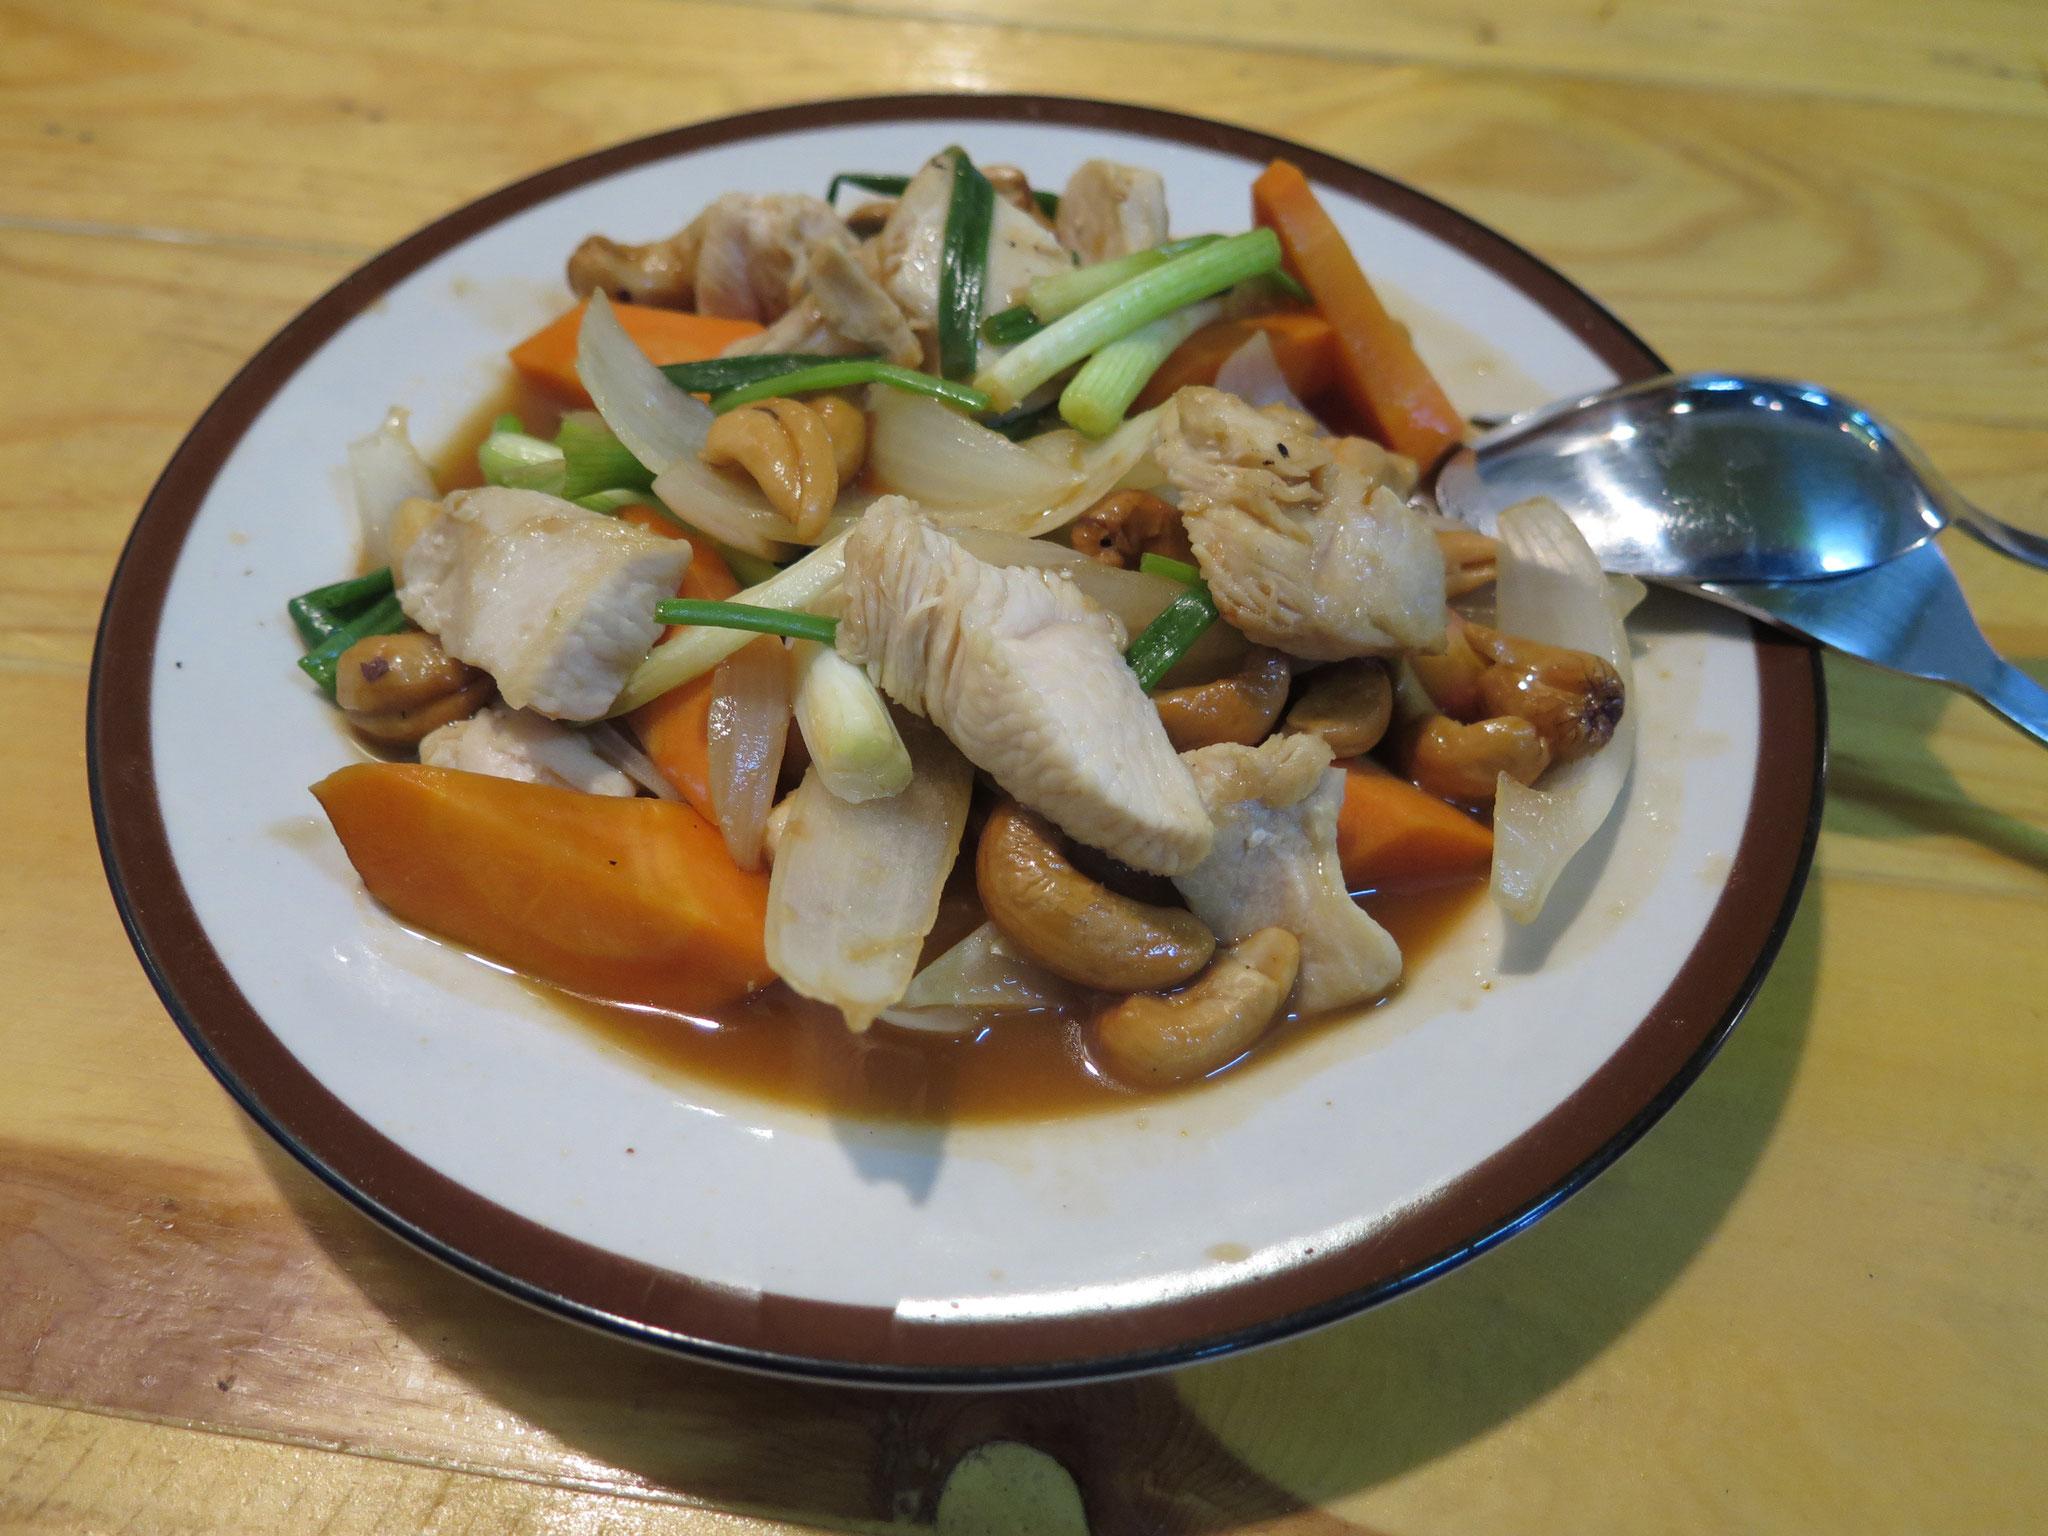 Cashew nuts with chicken